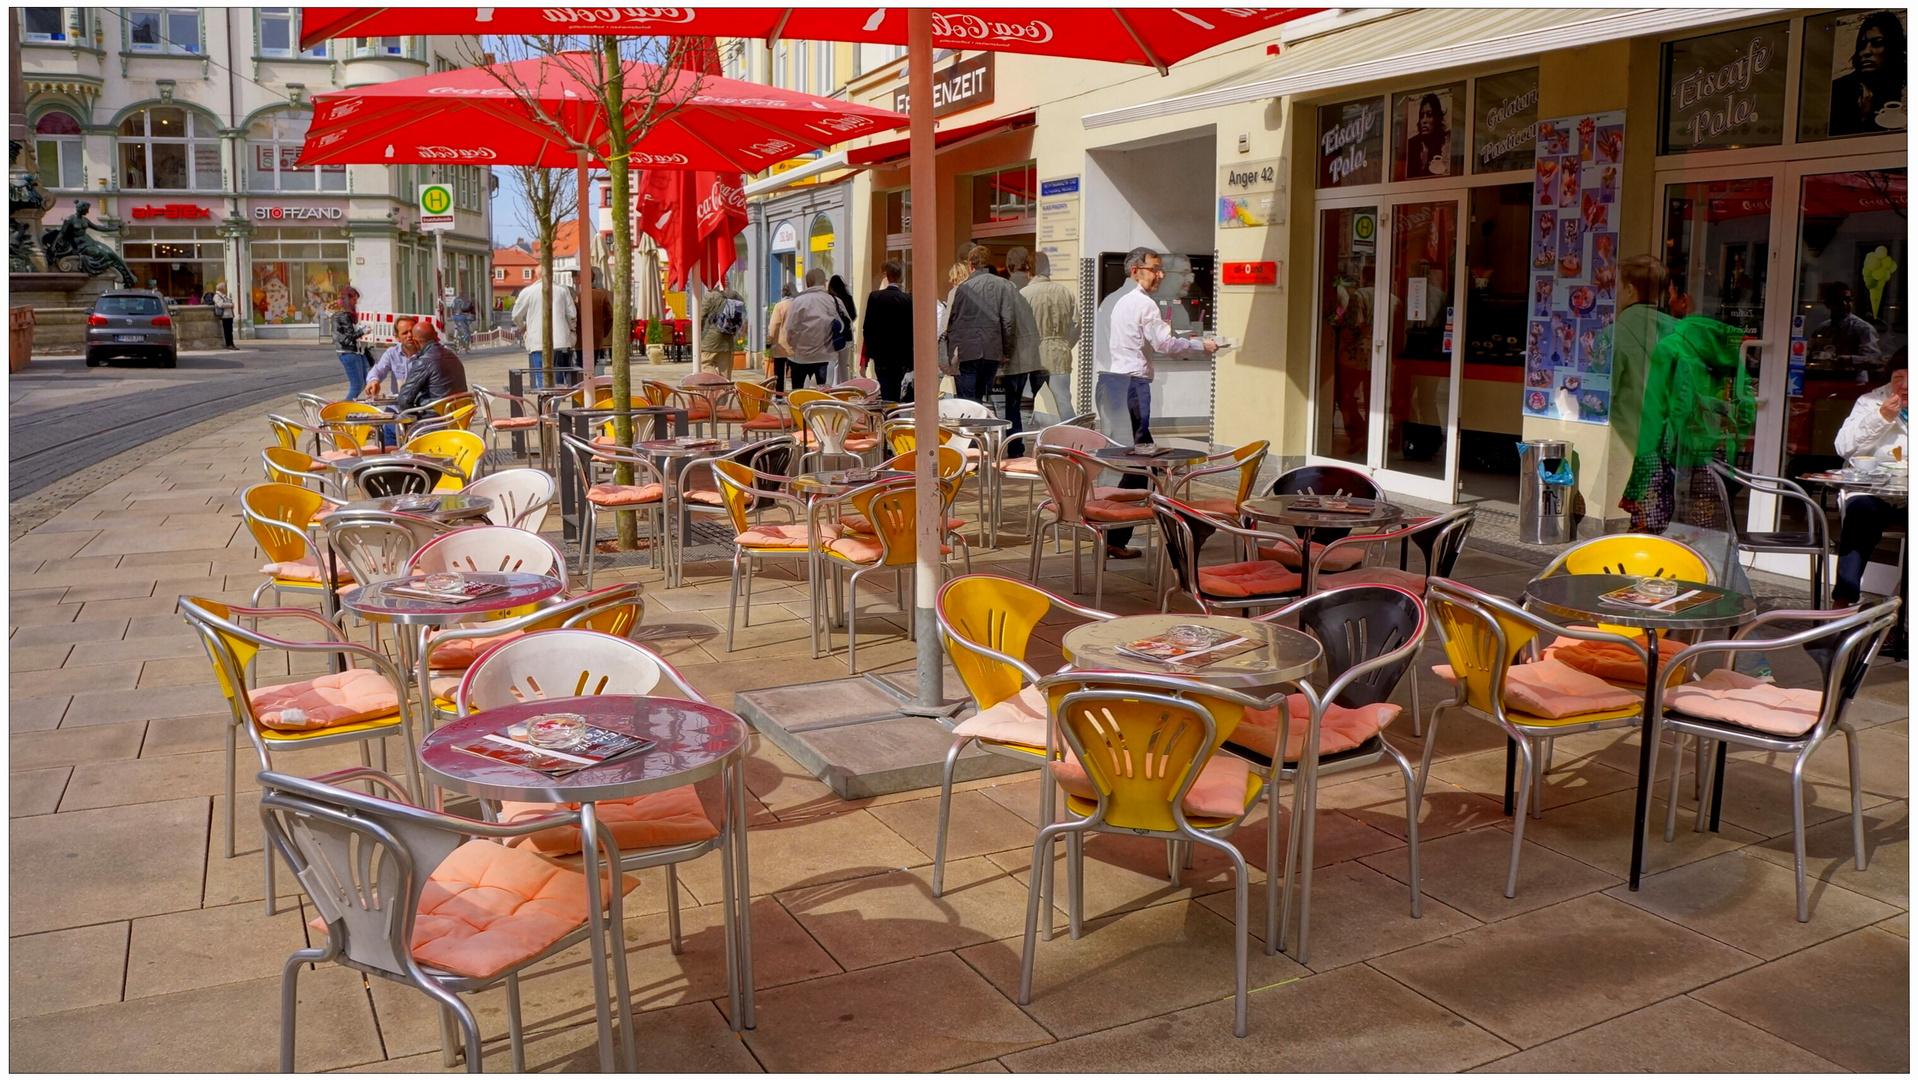 Erfurt, noch viele freie Plätze (todavía hay muchos sitios libres)